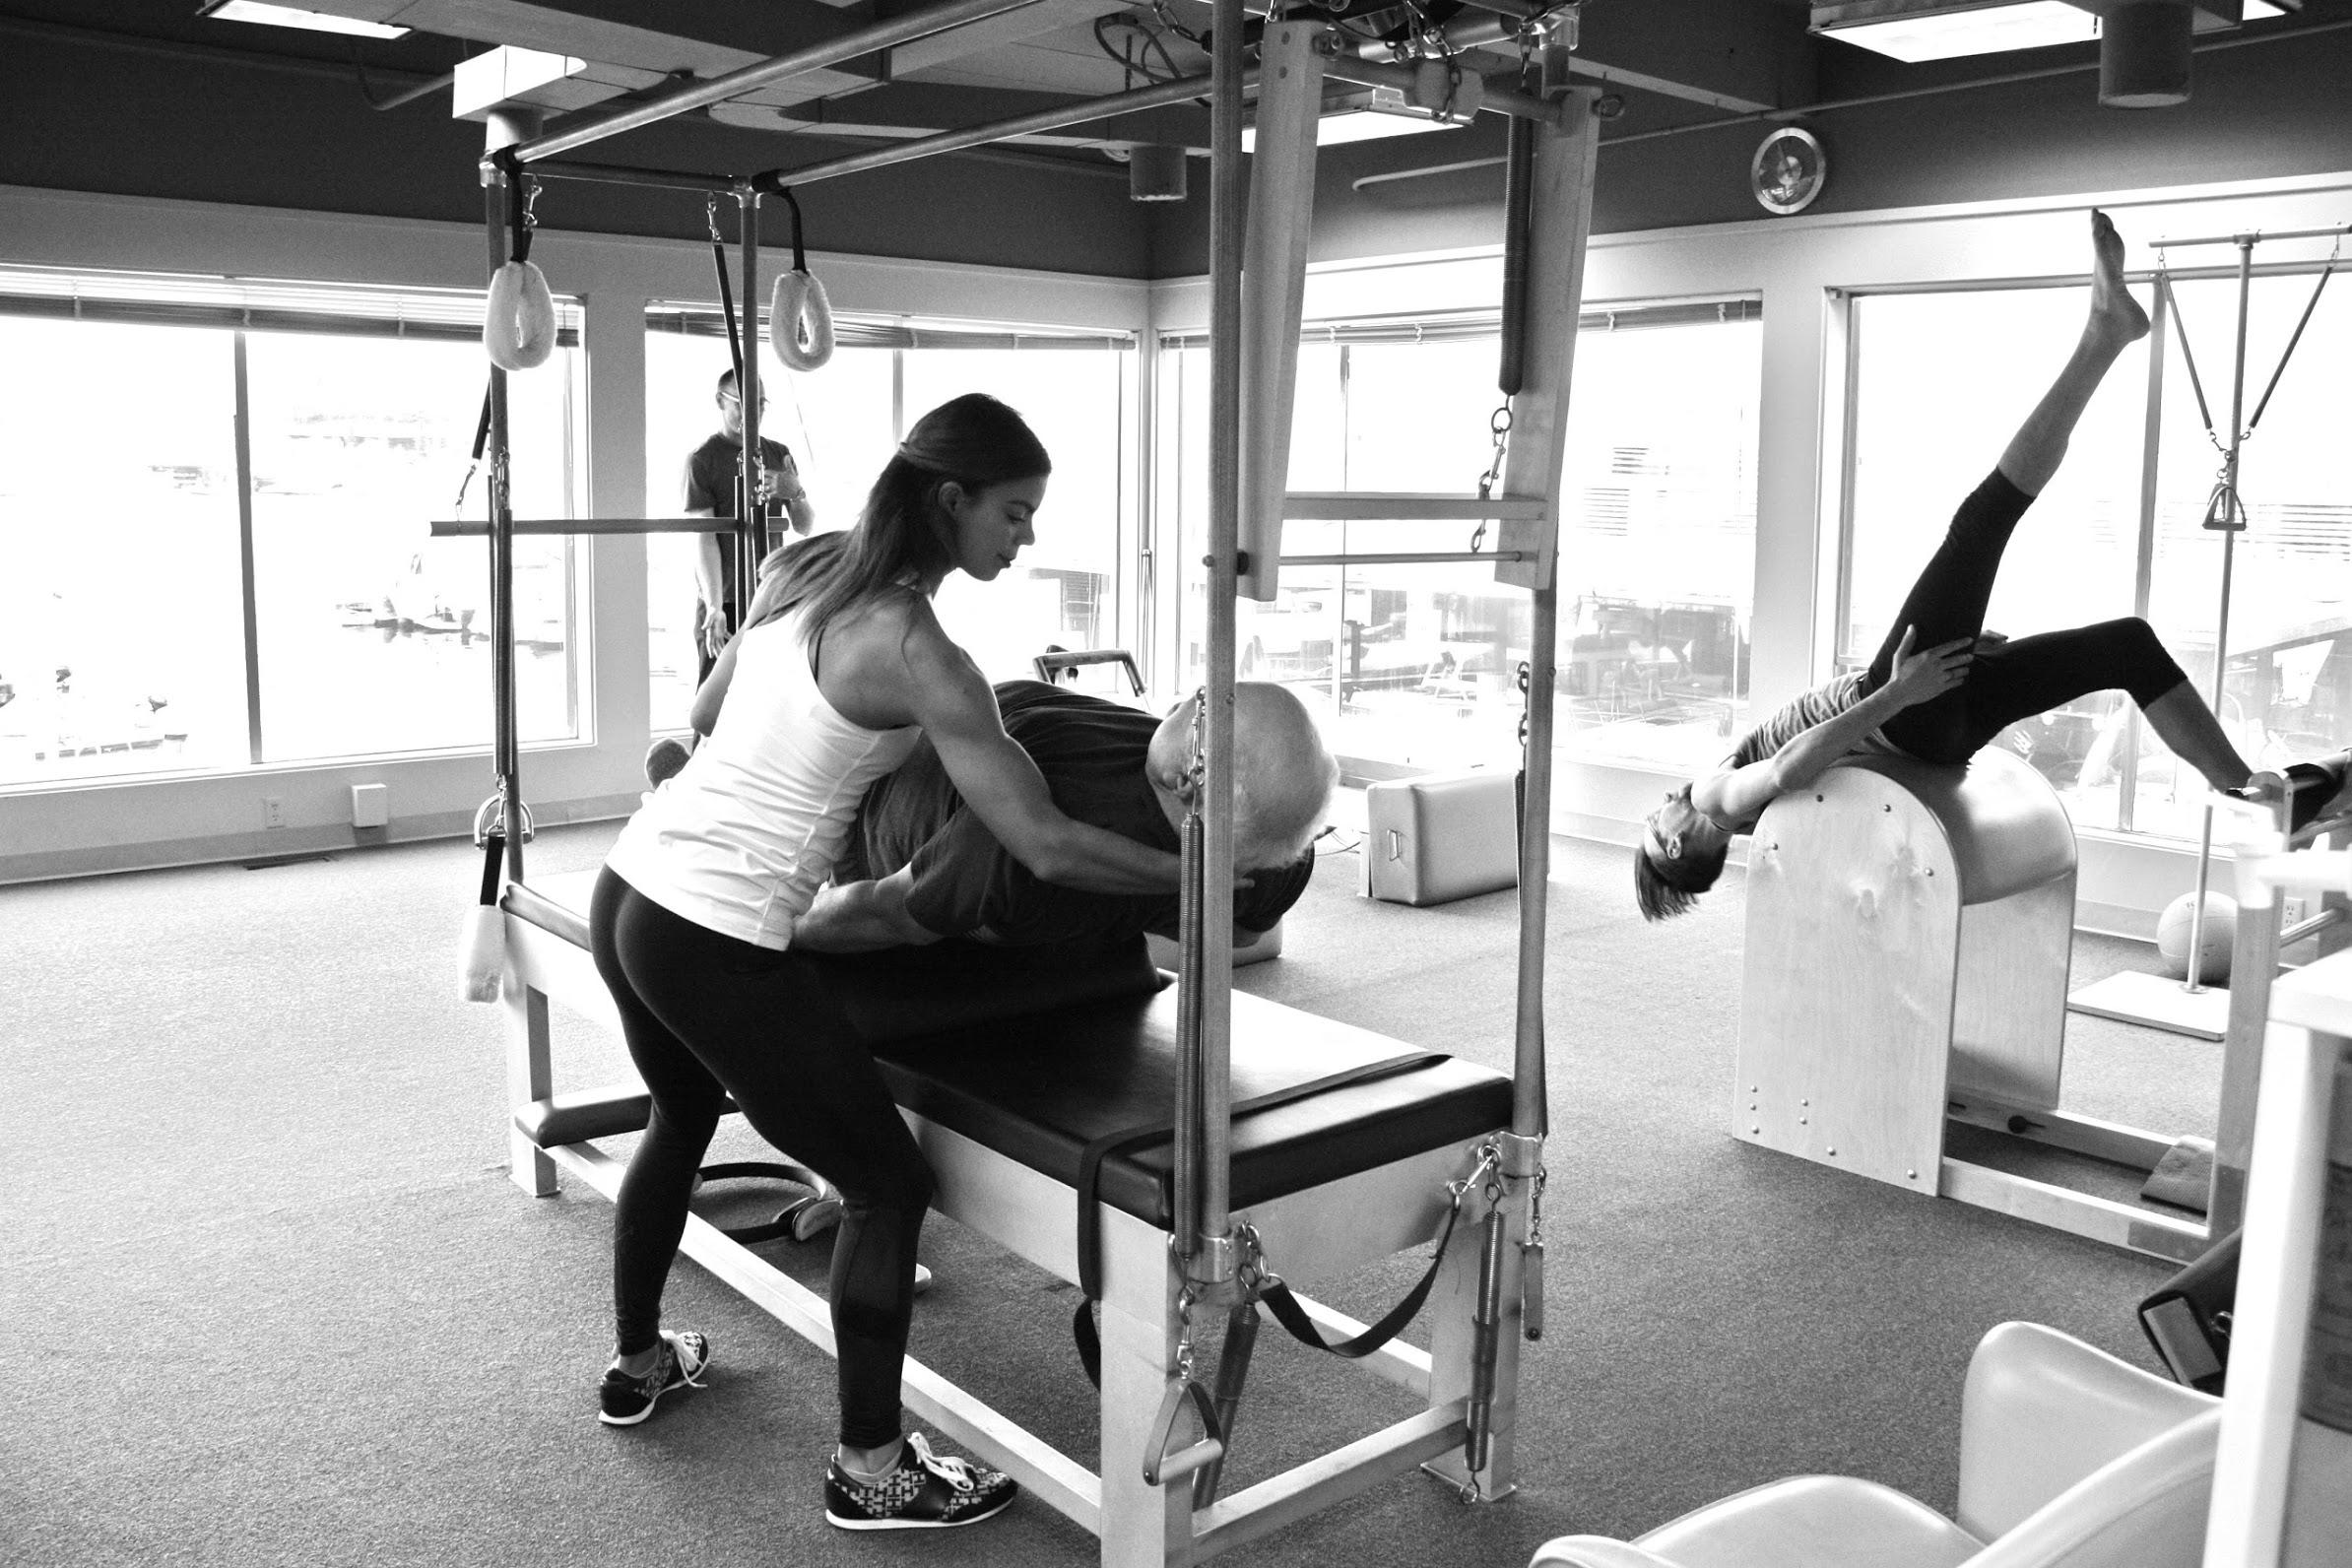 studiojacks-south-lake-union-pilates-instructors.jpg